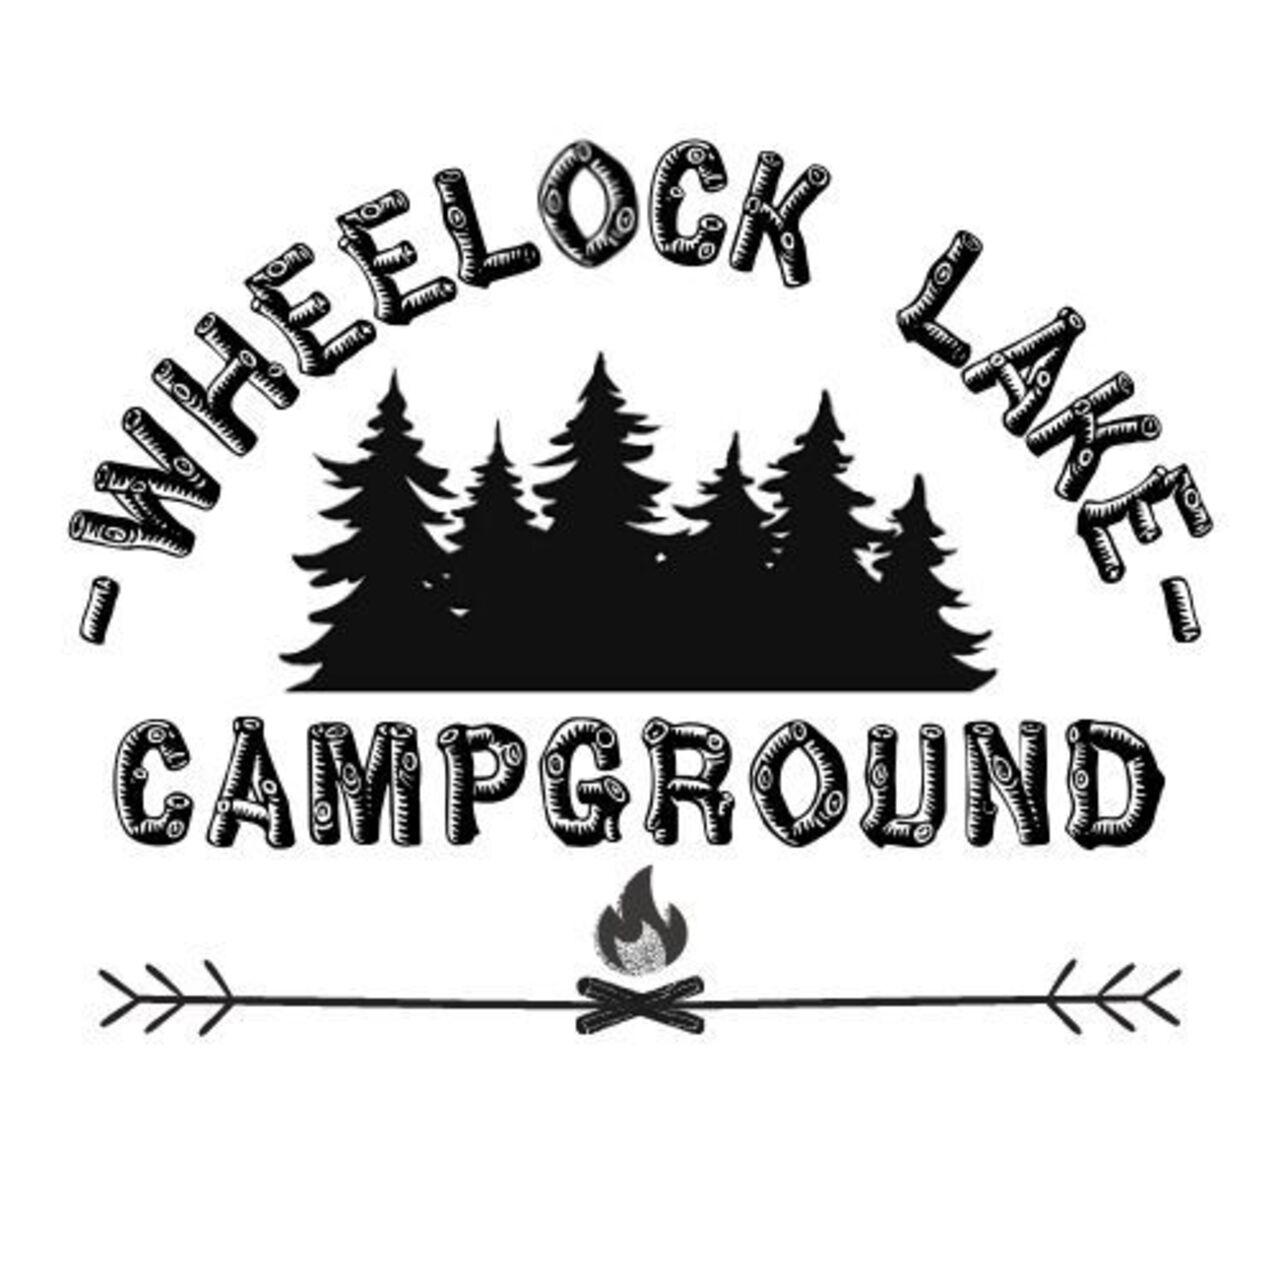 Wheelock Campground